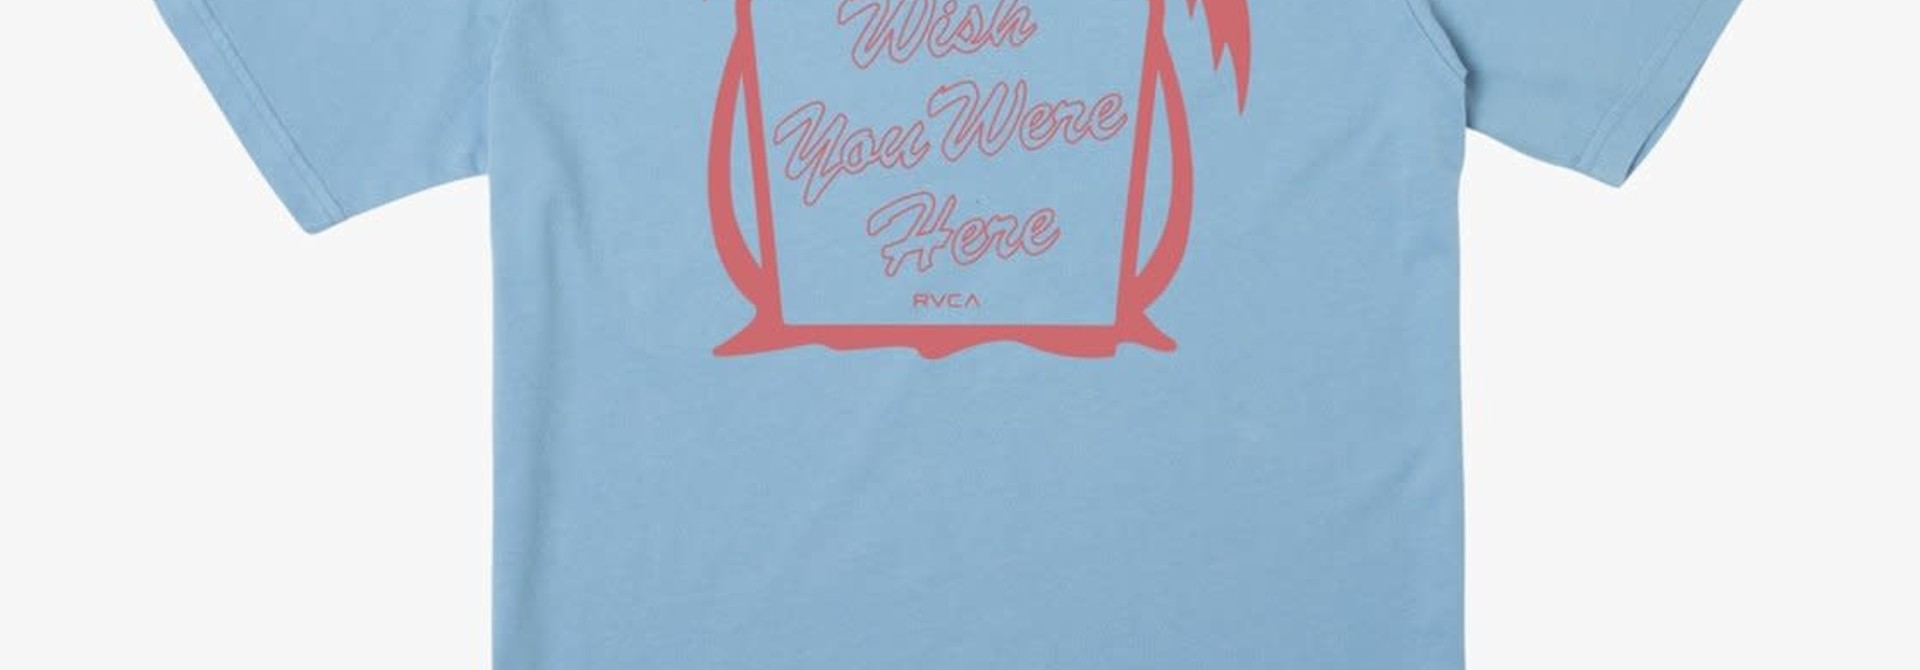 RVCA Were Here T-shirt